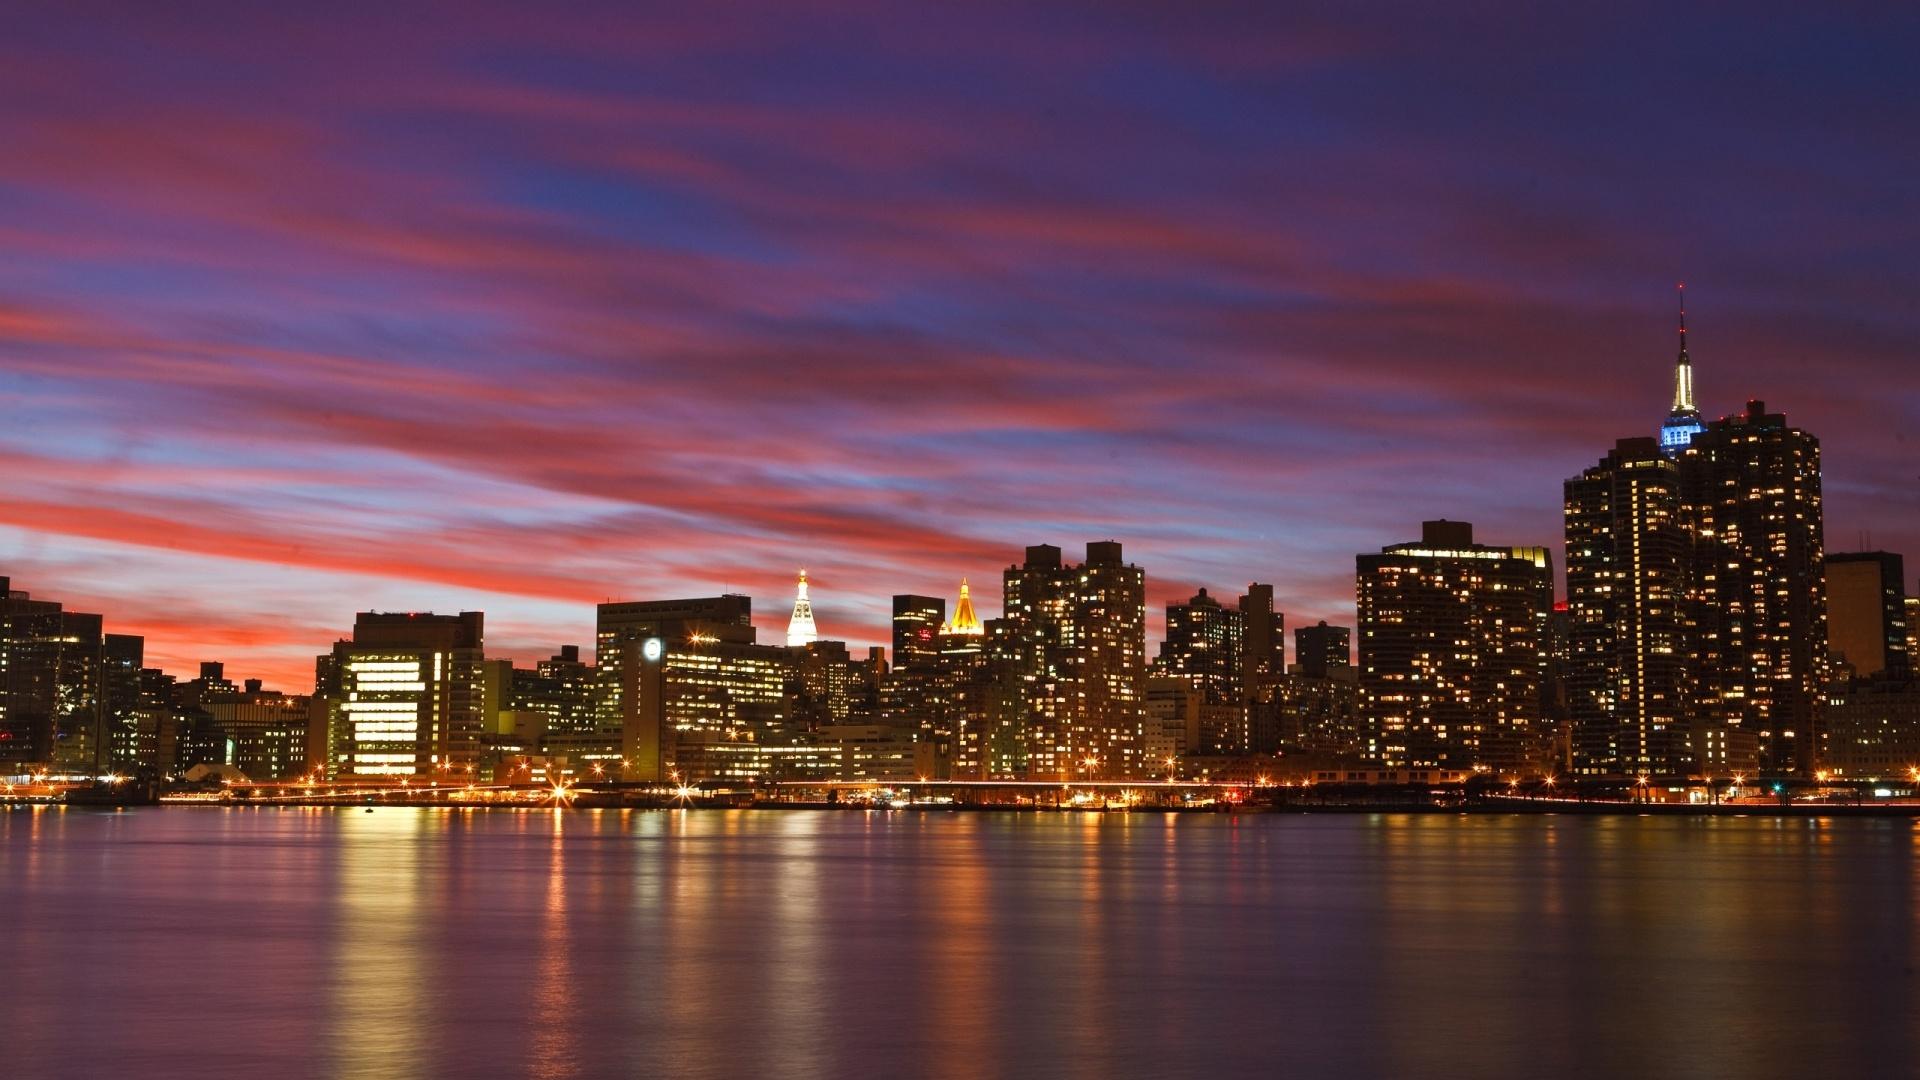 Skyline New York New York City Sunset Background 1920x1080 Download Hd Wallpaper Wallpapertip